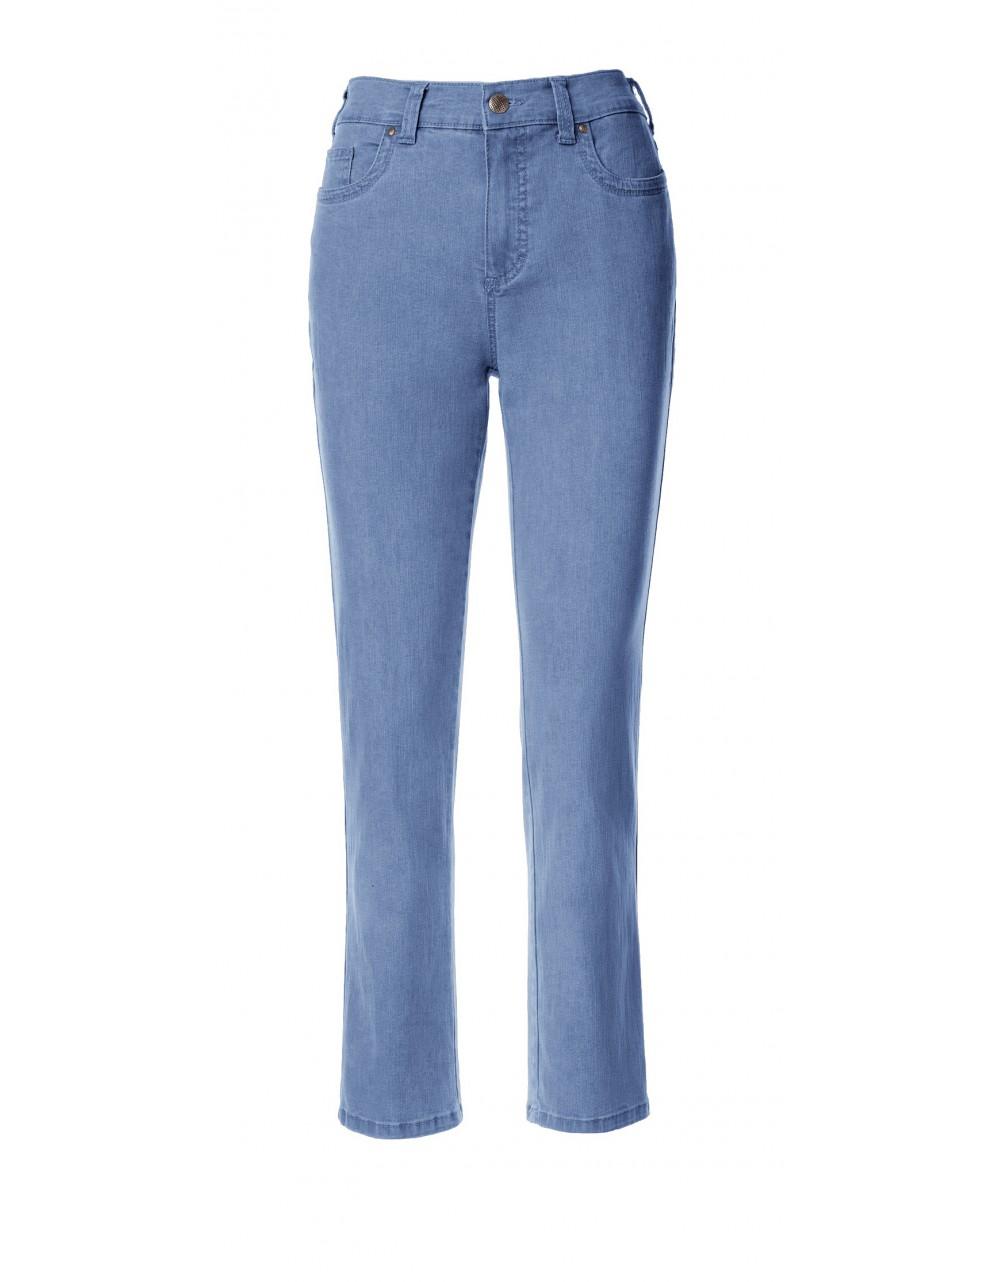 Anna Montana Dora London Jeans Summerstone 1